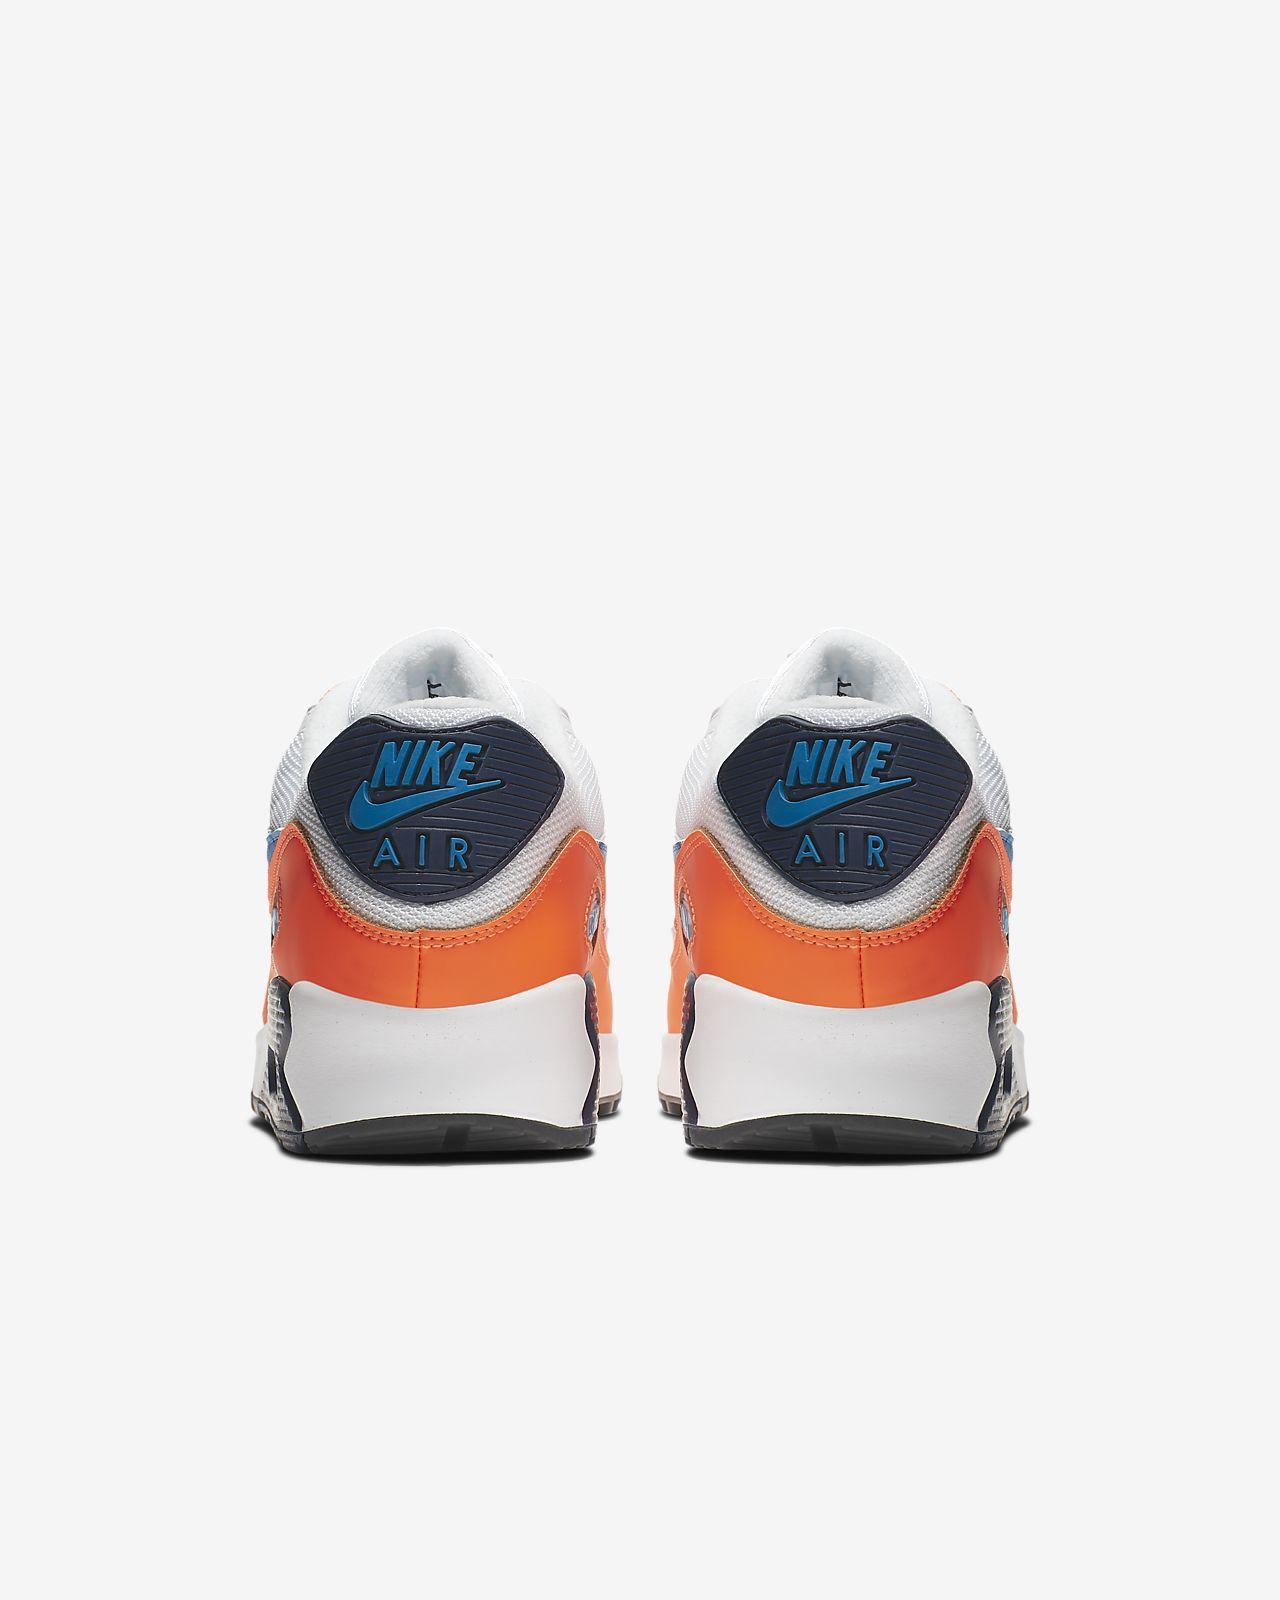 Homme Max 90 Chaussure Pour Tqcbhrxsd Air Nike Essential HY9EWD2I